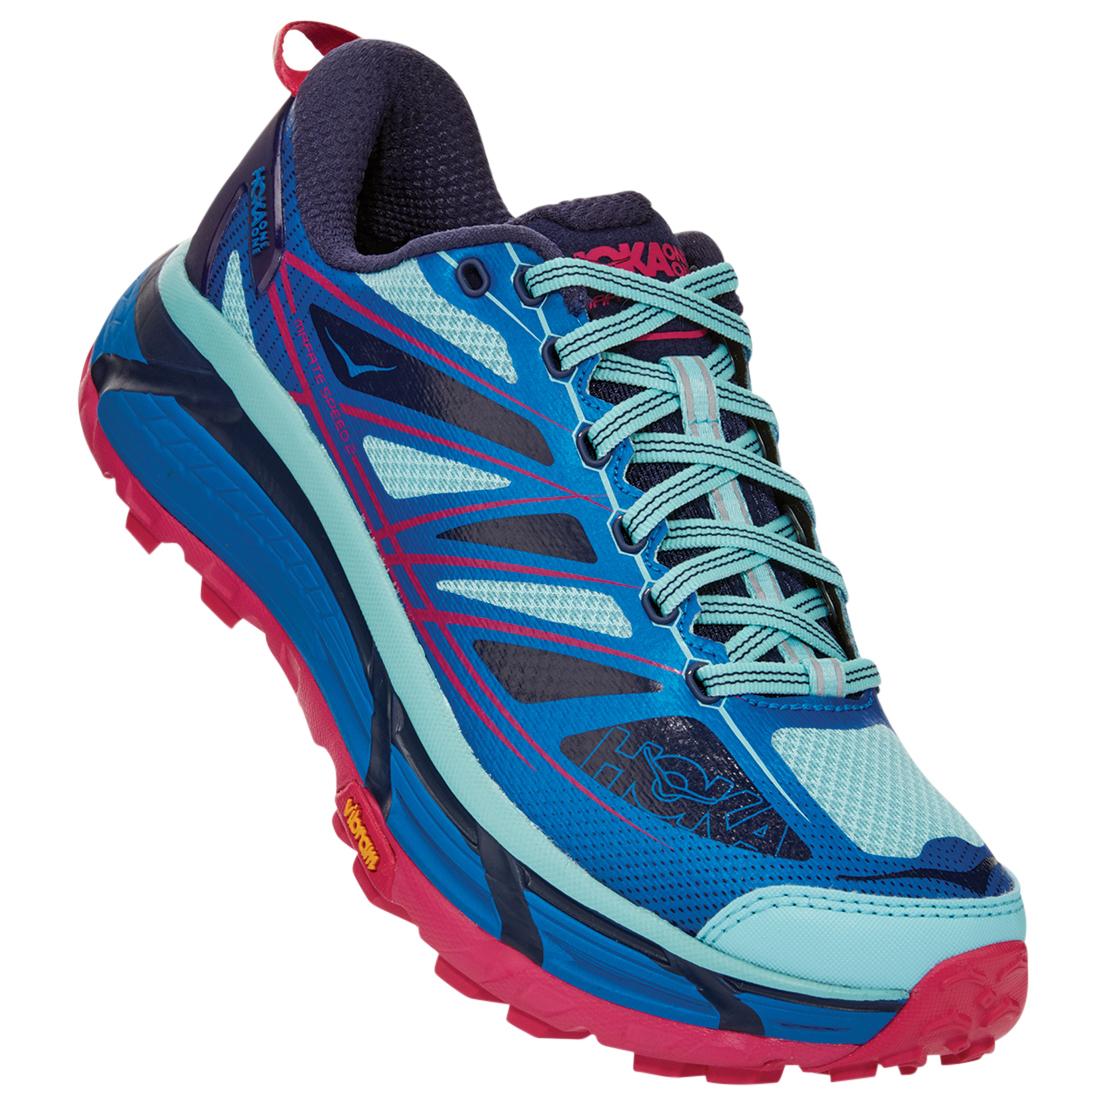 Mafate Speed 2 - Trail running shoes